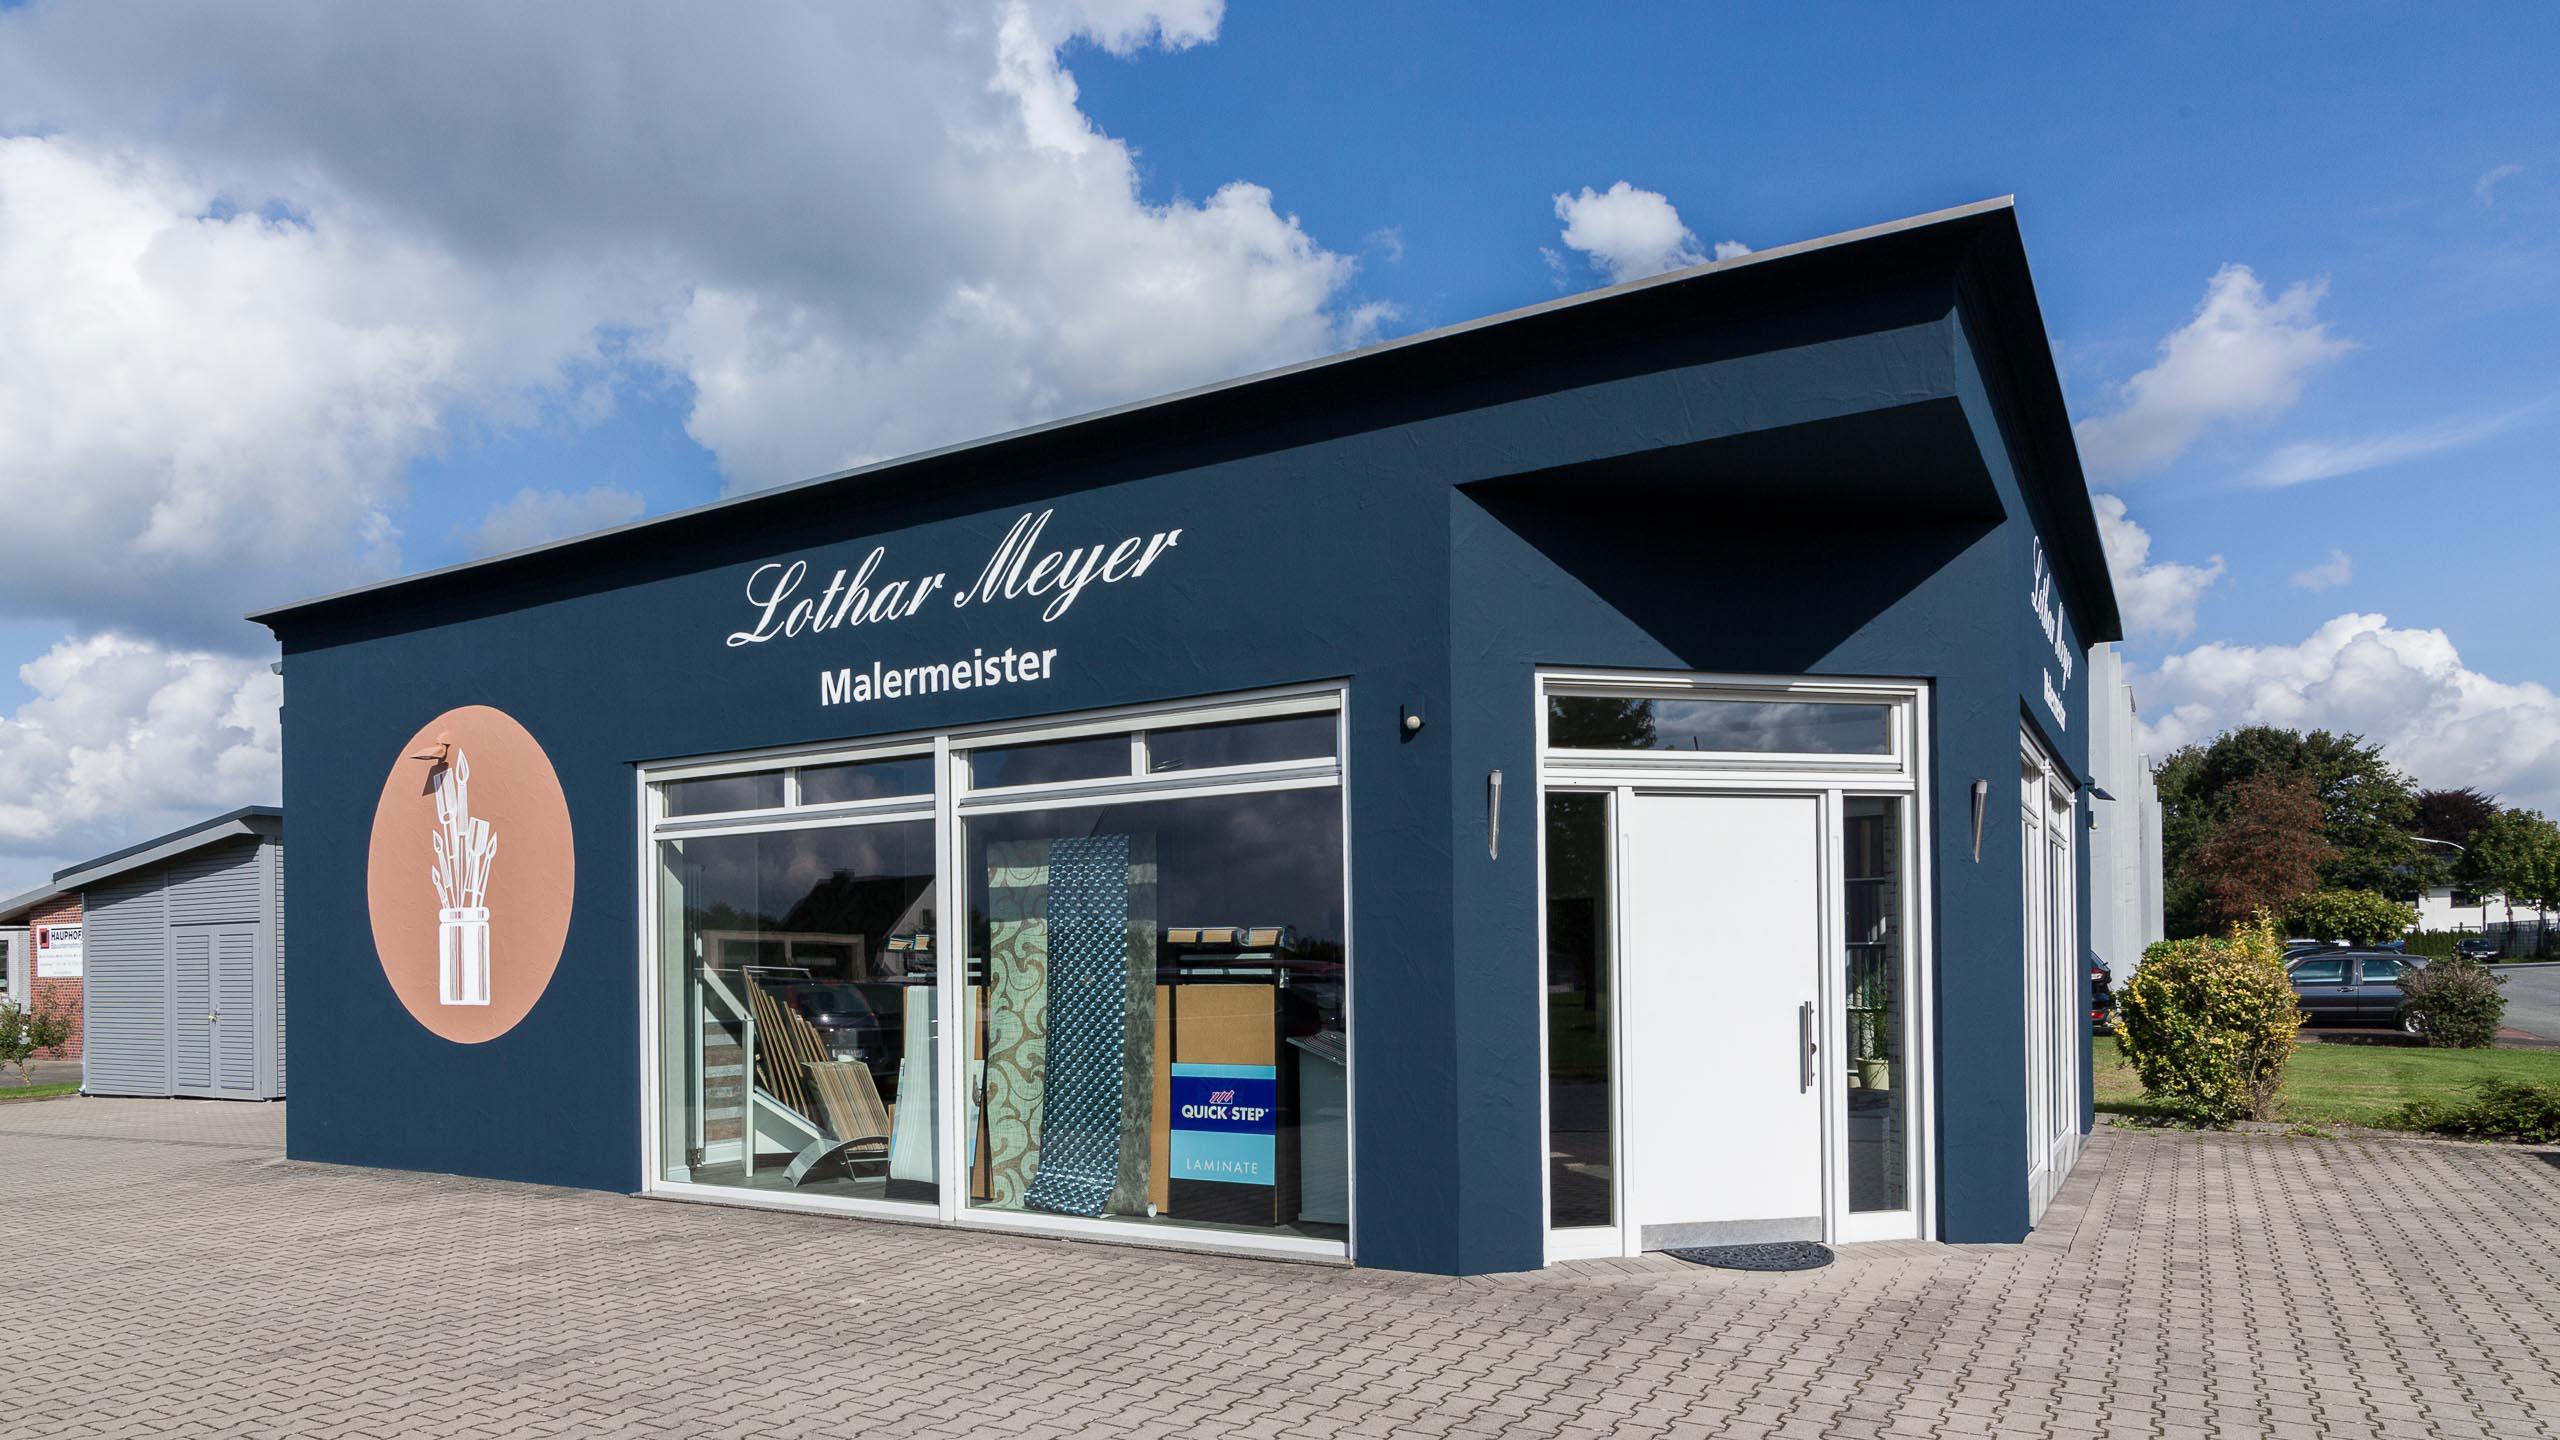 Malermeister Lothar Meyer Verl Betrieb